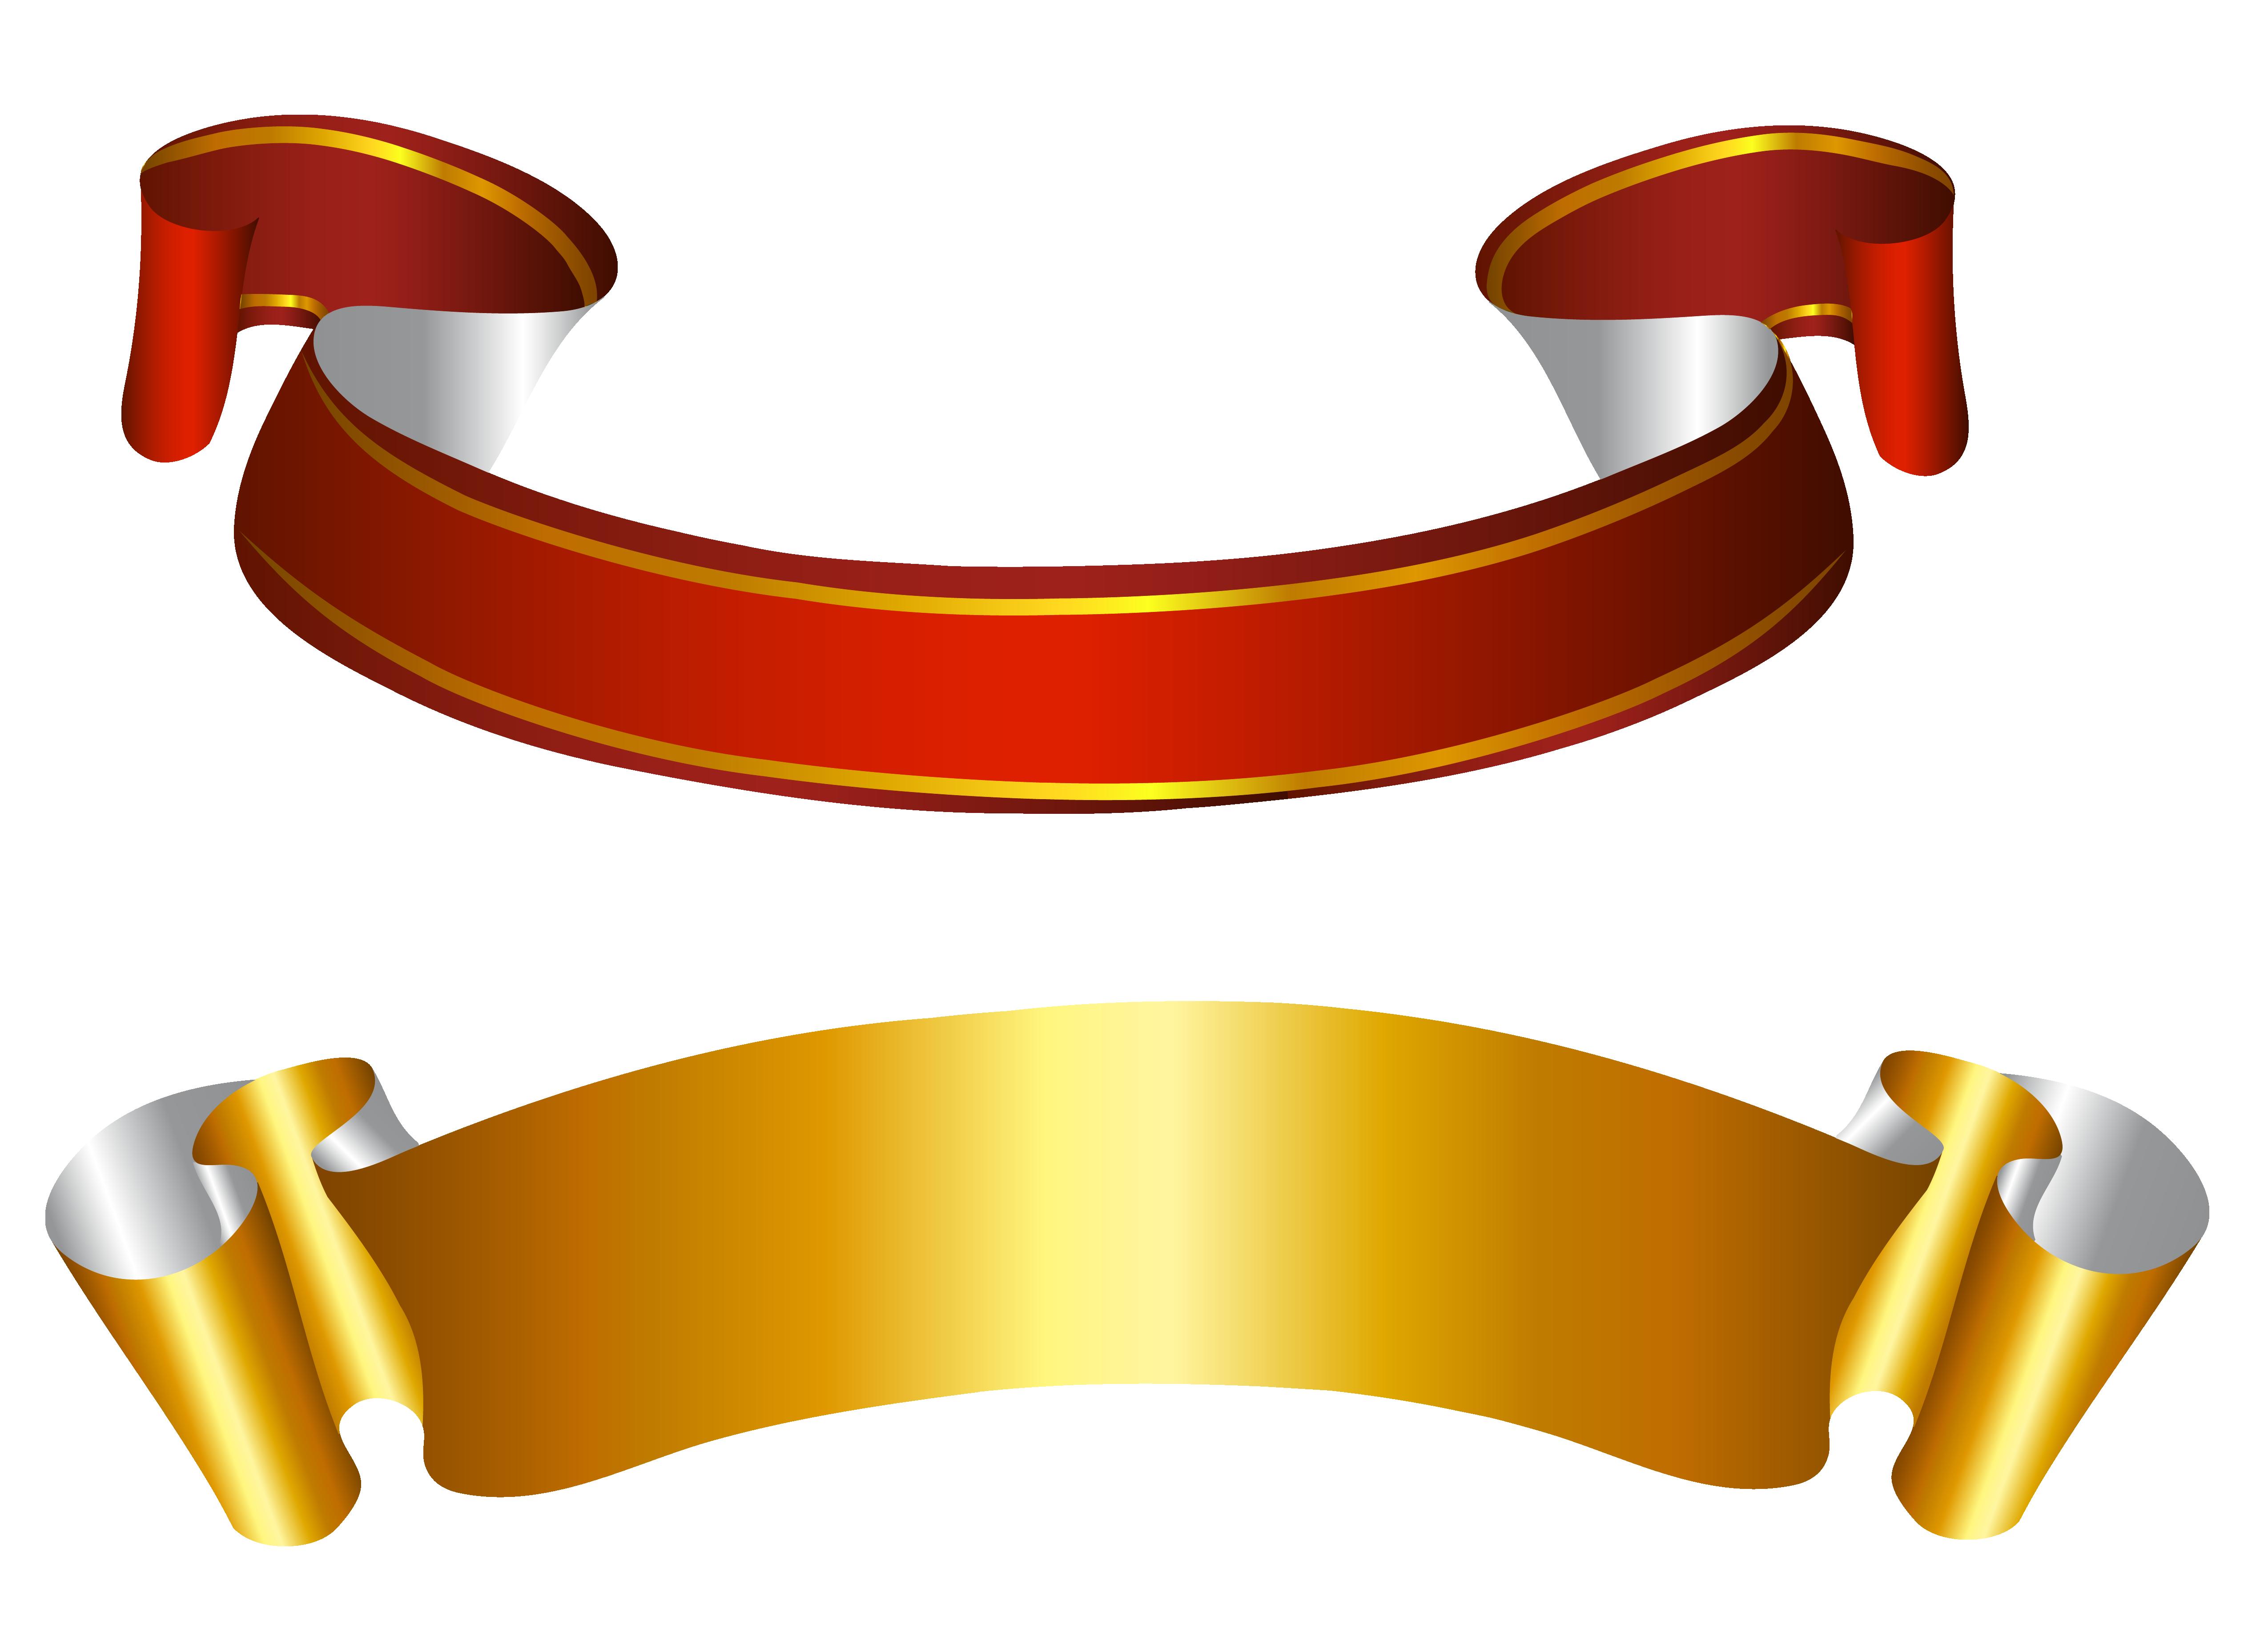 ribbon clip art free vector - photo #24